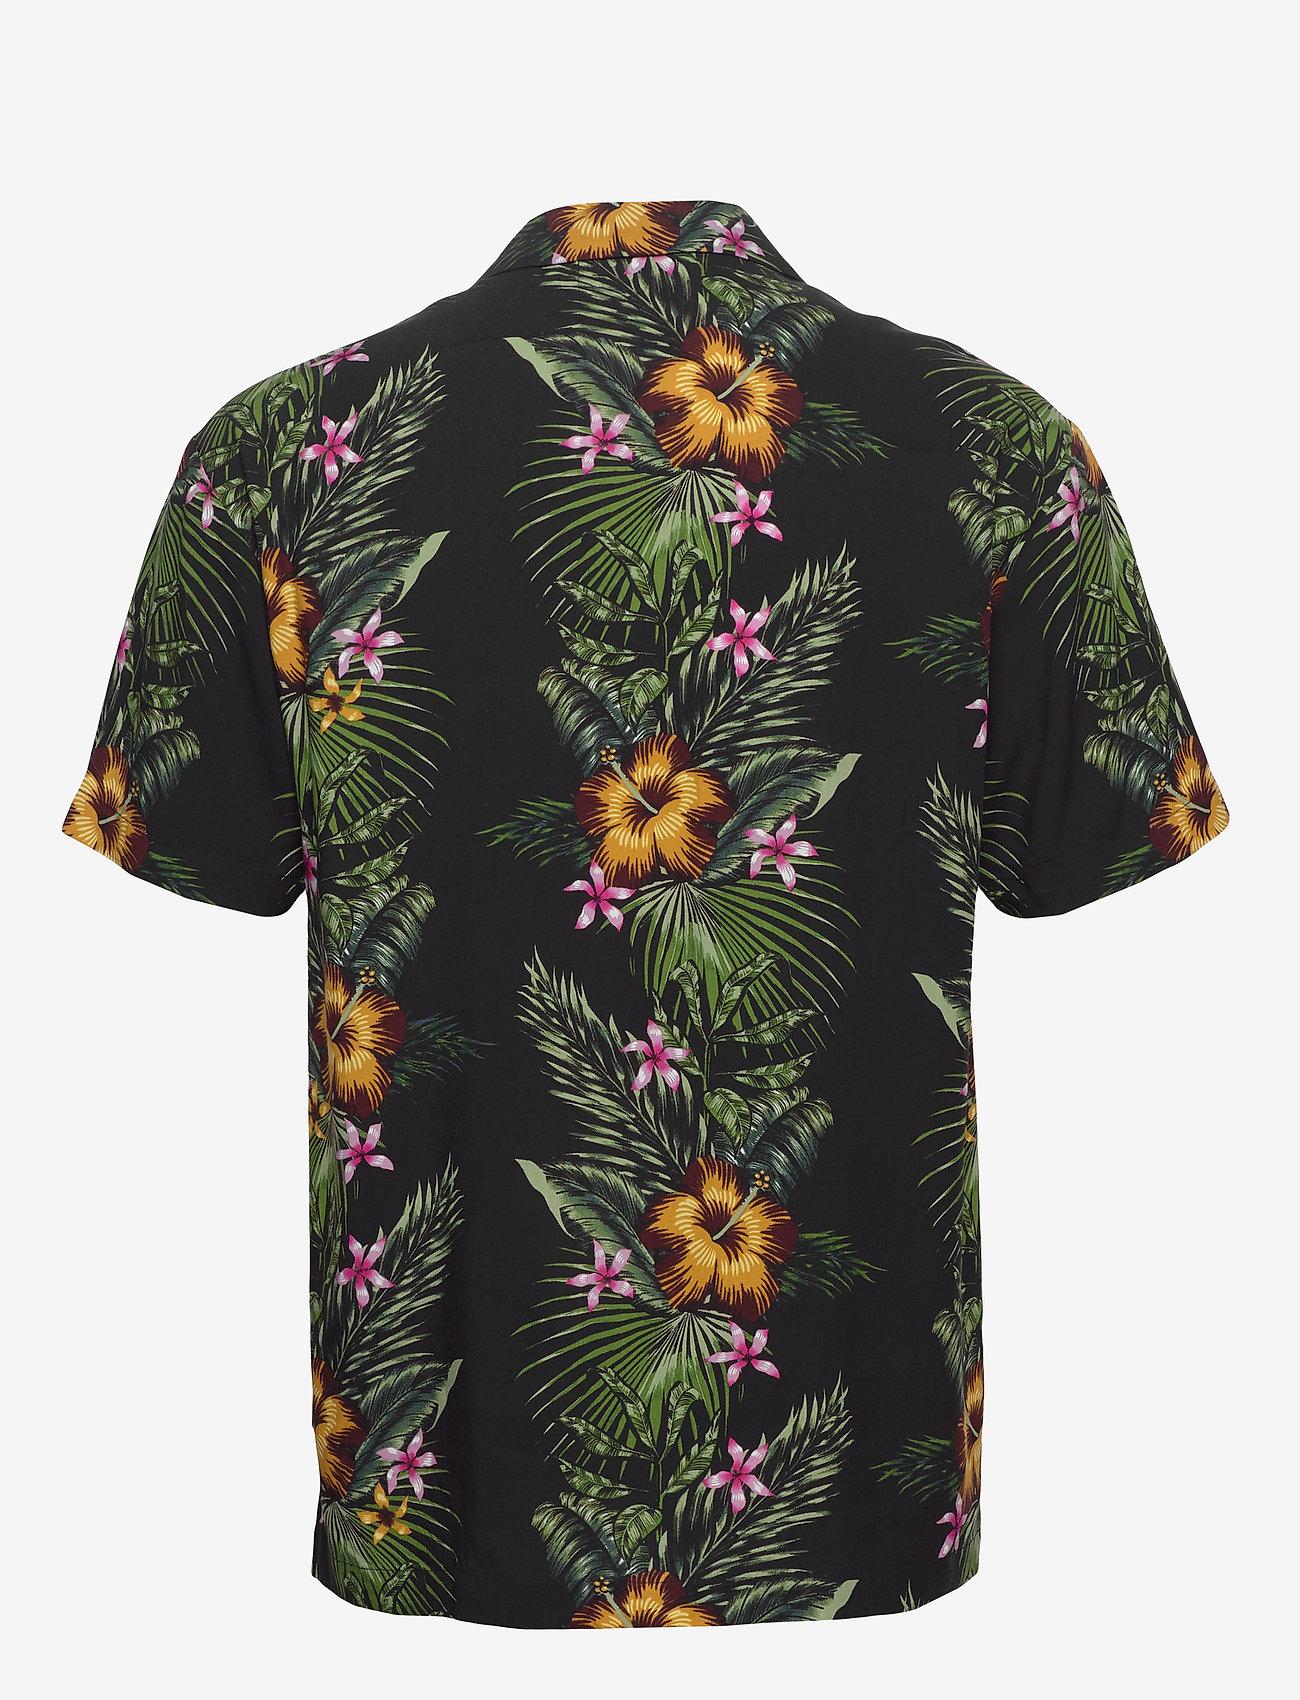 Scotch & Soda - HAWAII FIT-  Shorstleeve shirt with Hawaiian flower print - kortærmede skjorter - combo a - 1